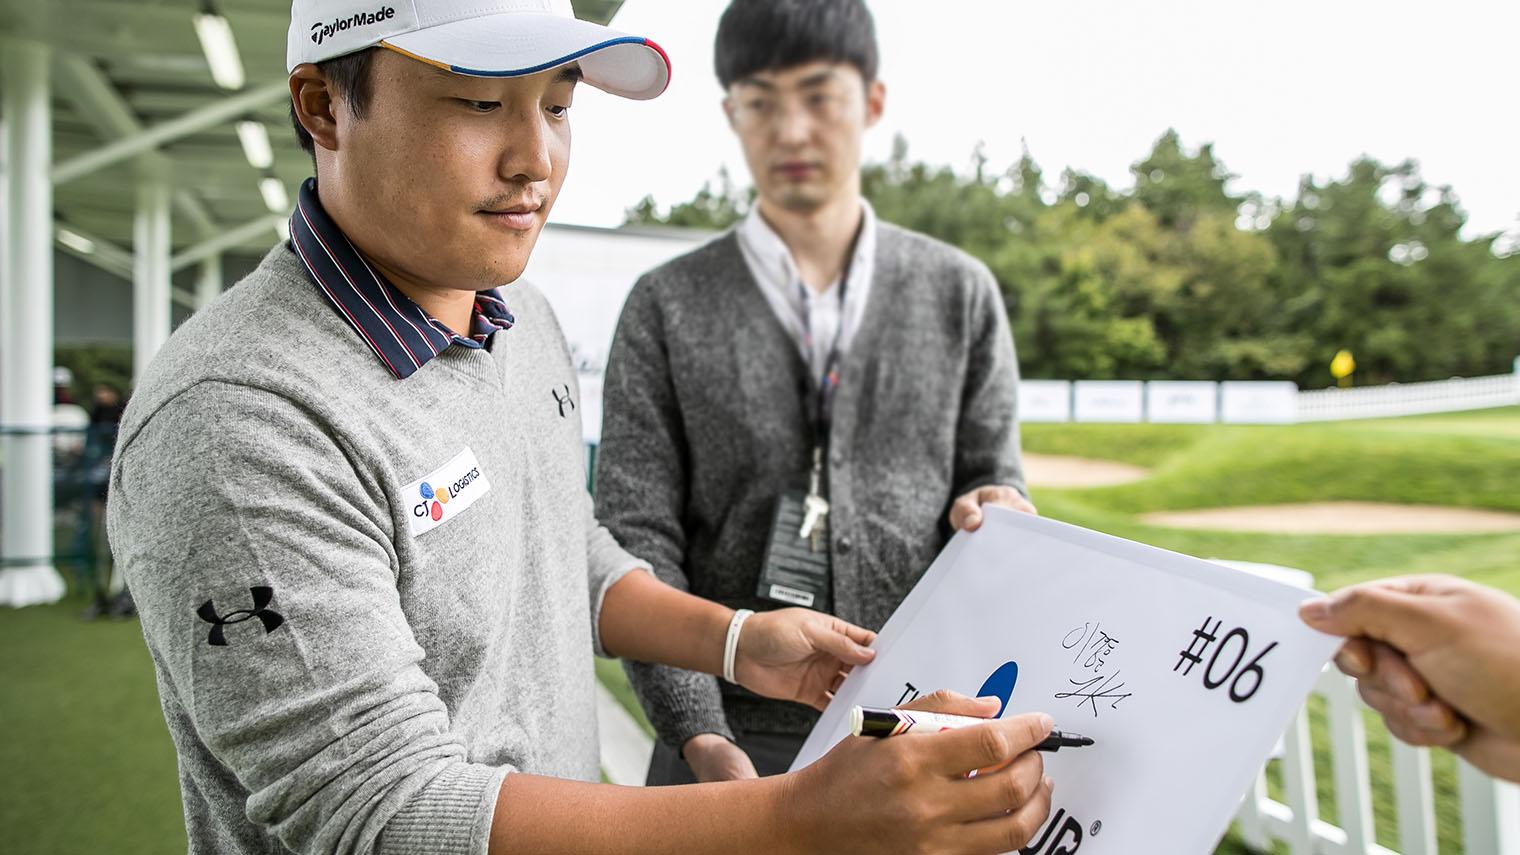 PGA TOUR 출전 이경훈 선수! 멋진 활약을 기대합니다.